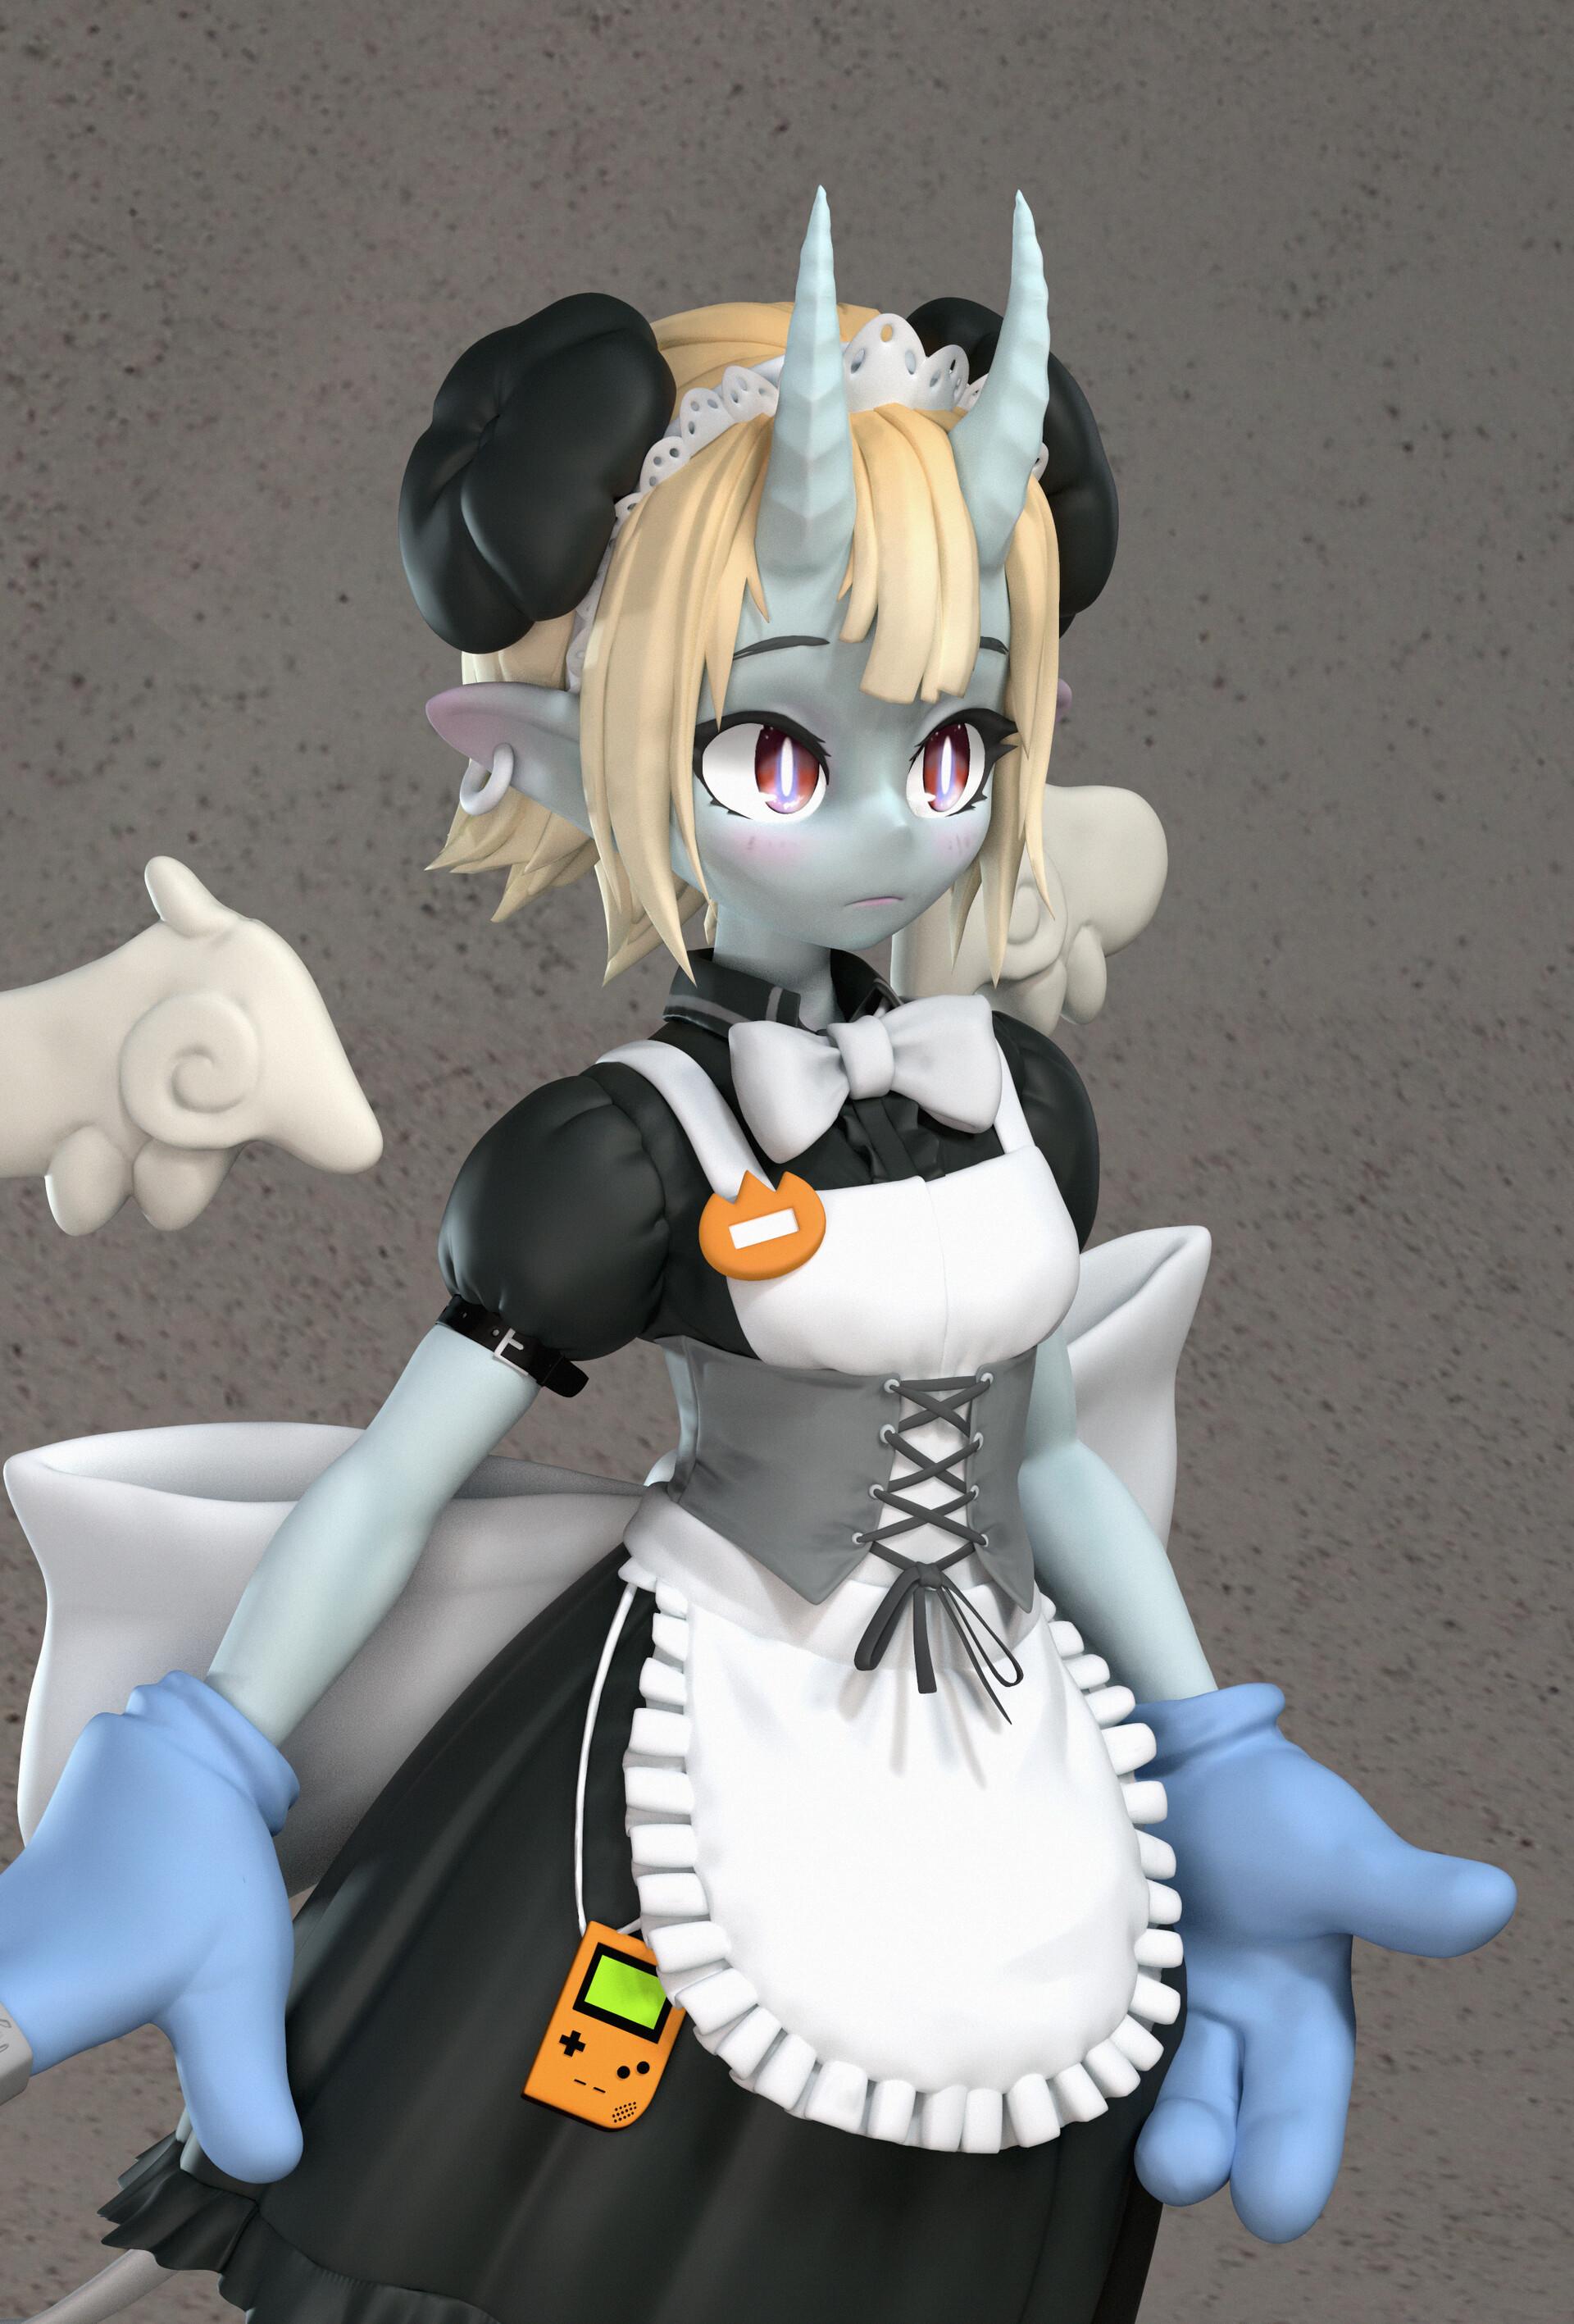 Devil Maid Girl | Zbrush Sculpt